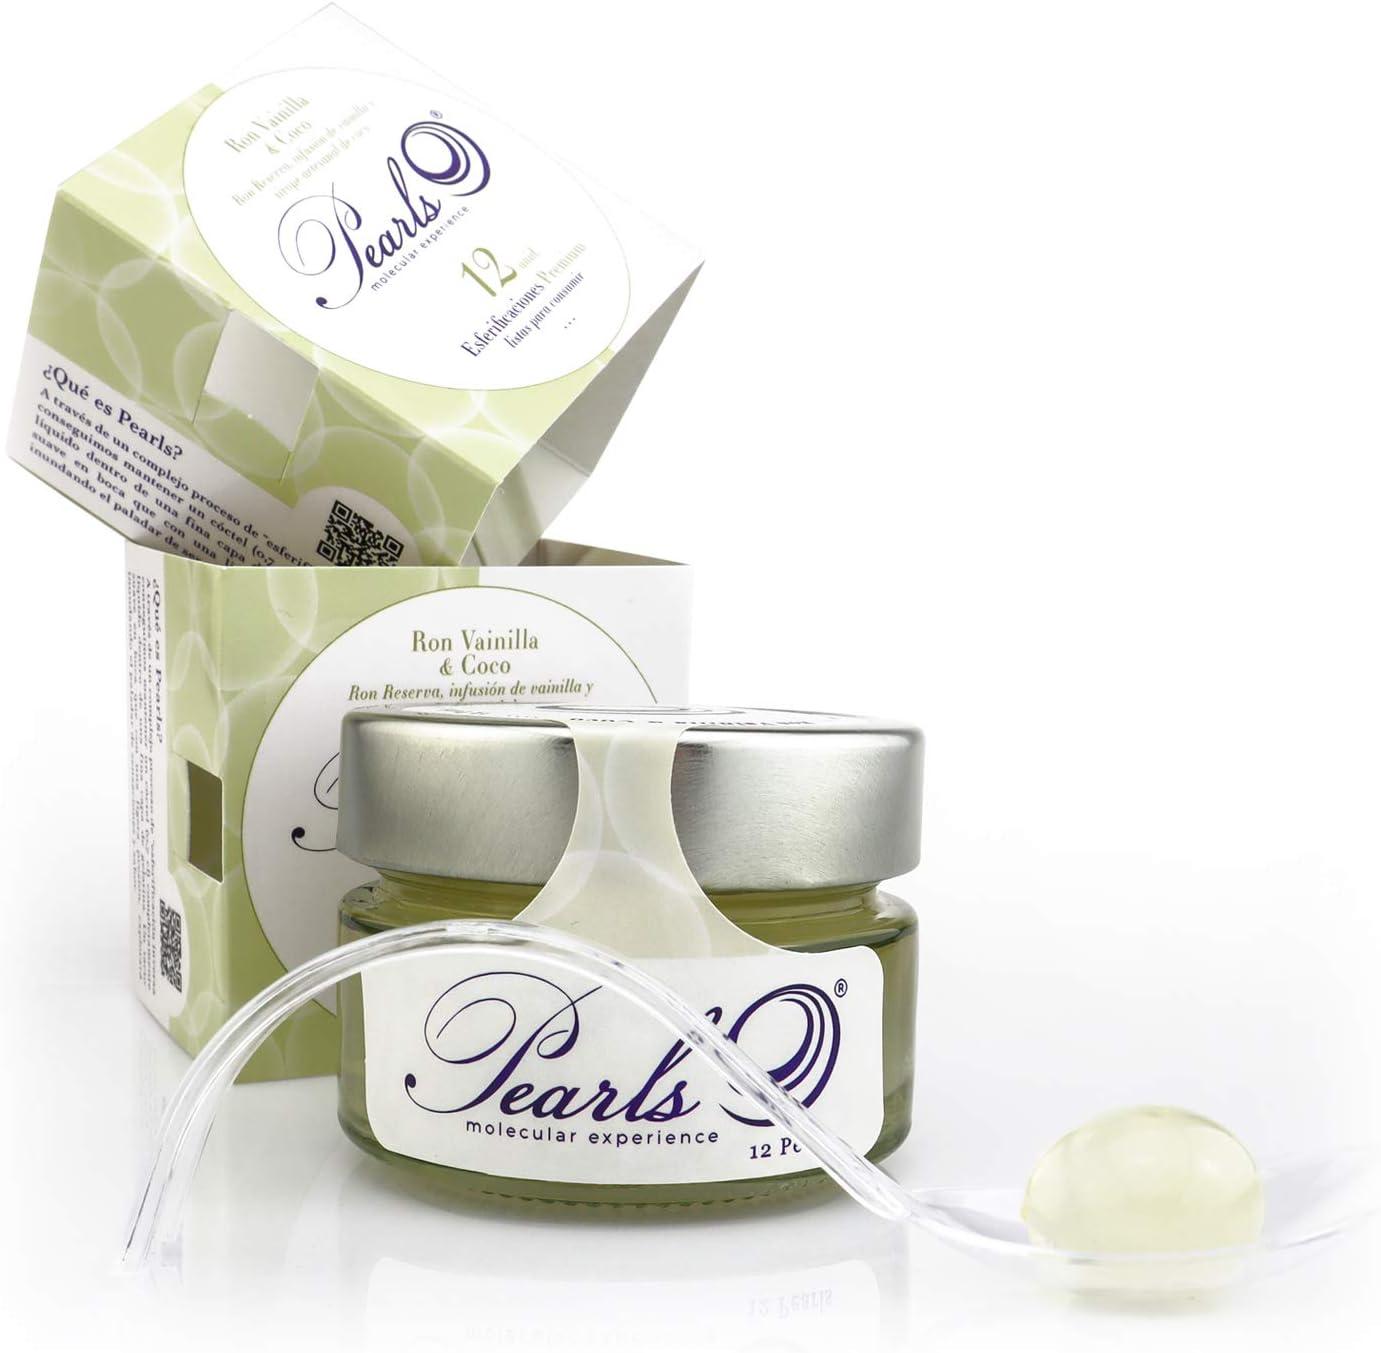 12 Pearls Ron Vainilla & Coco - Esferificaciones Premium ...